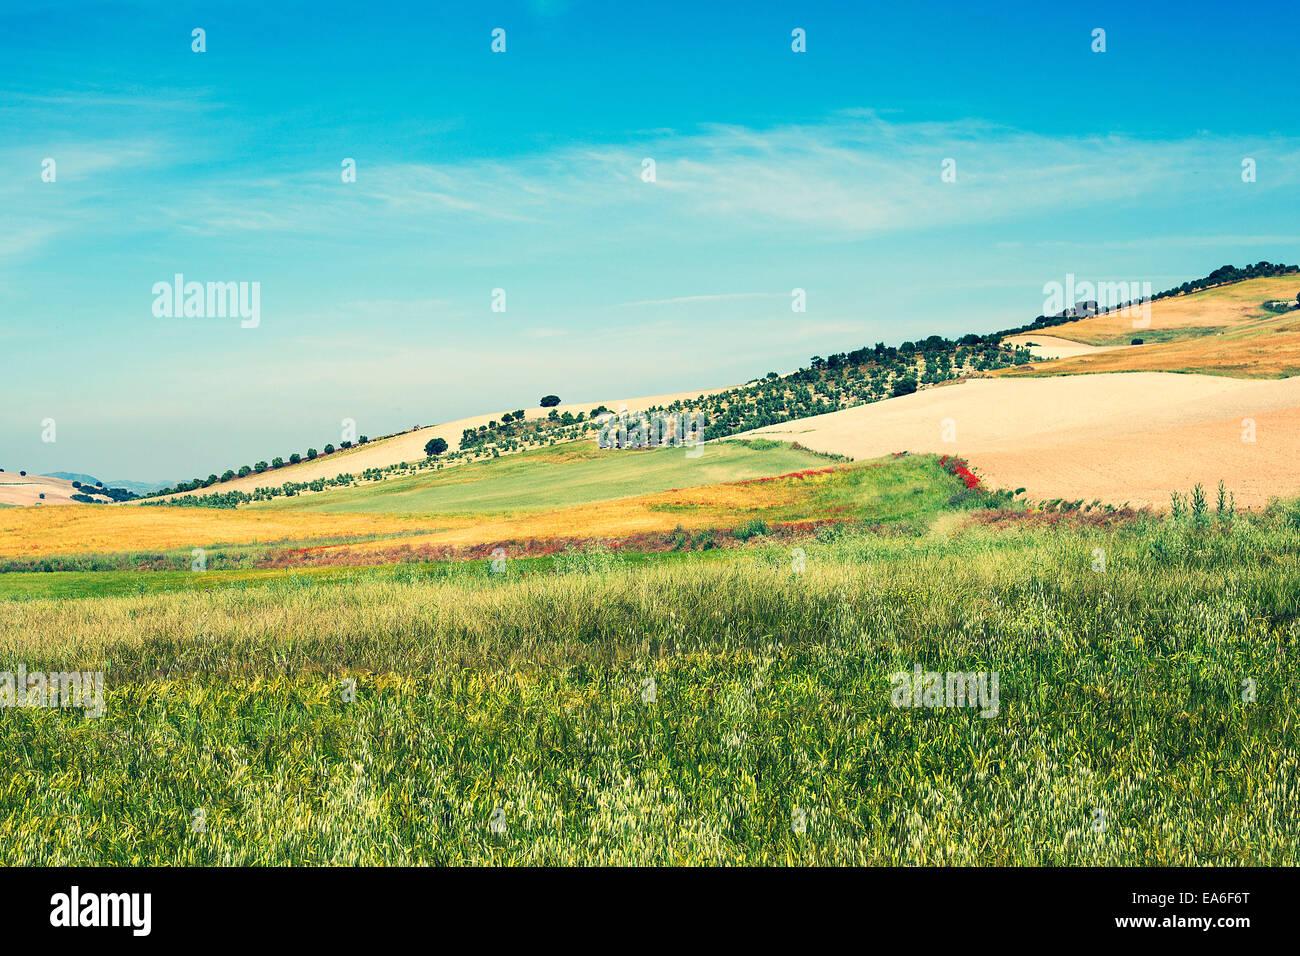 Rural landscape, Campo, Spain - Stock Image